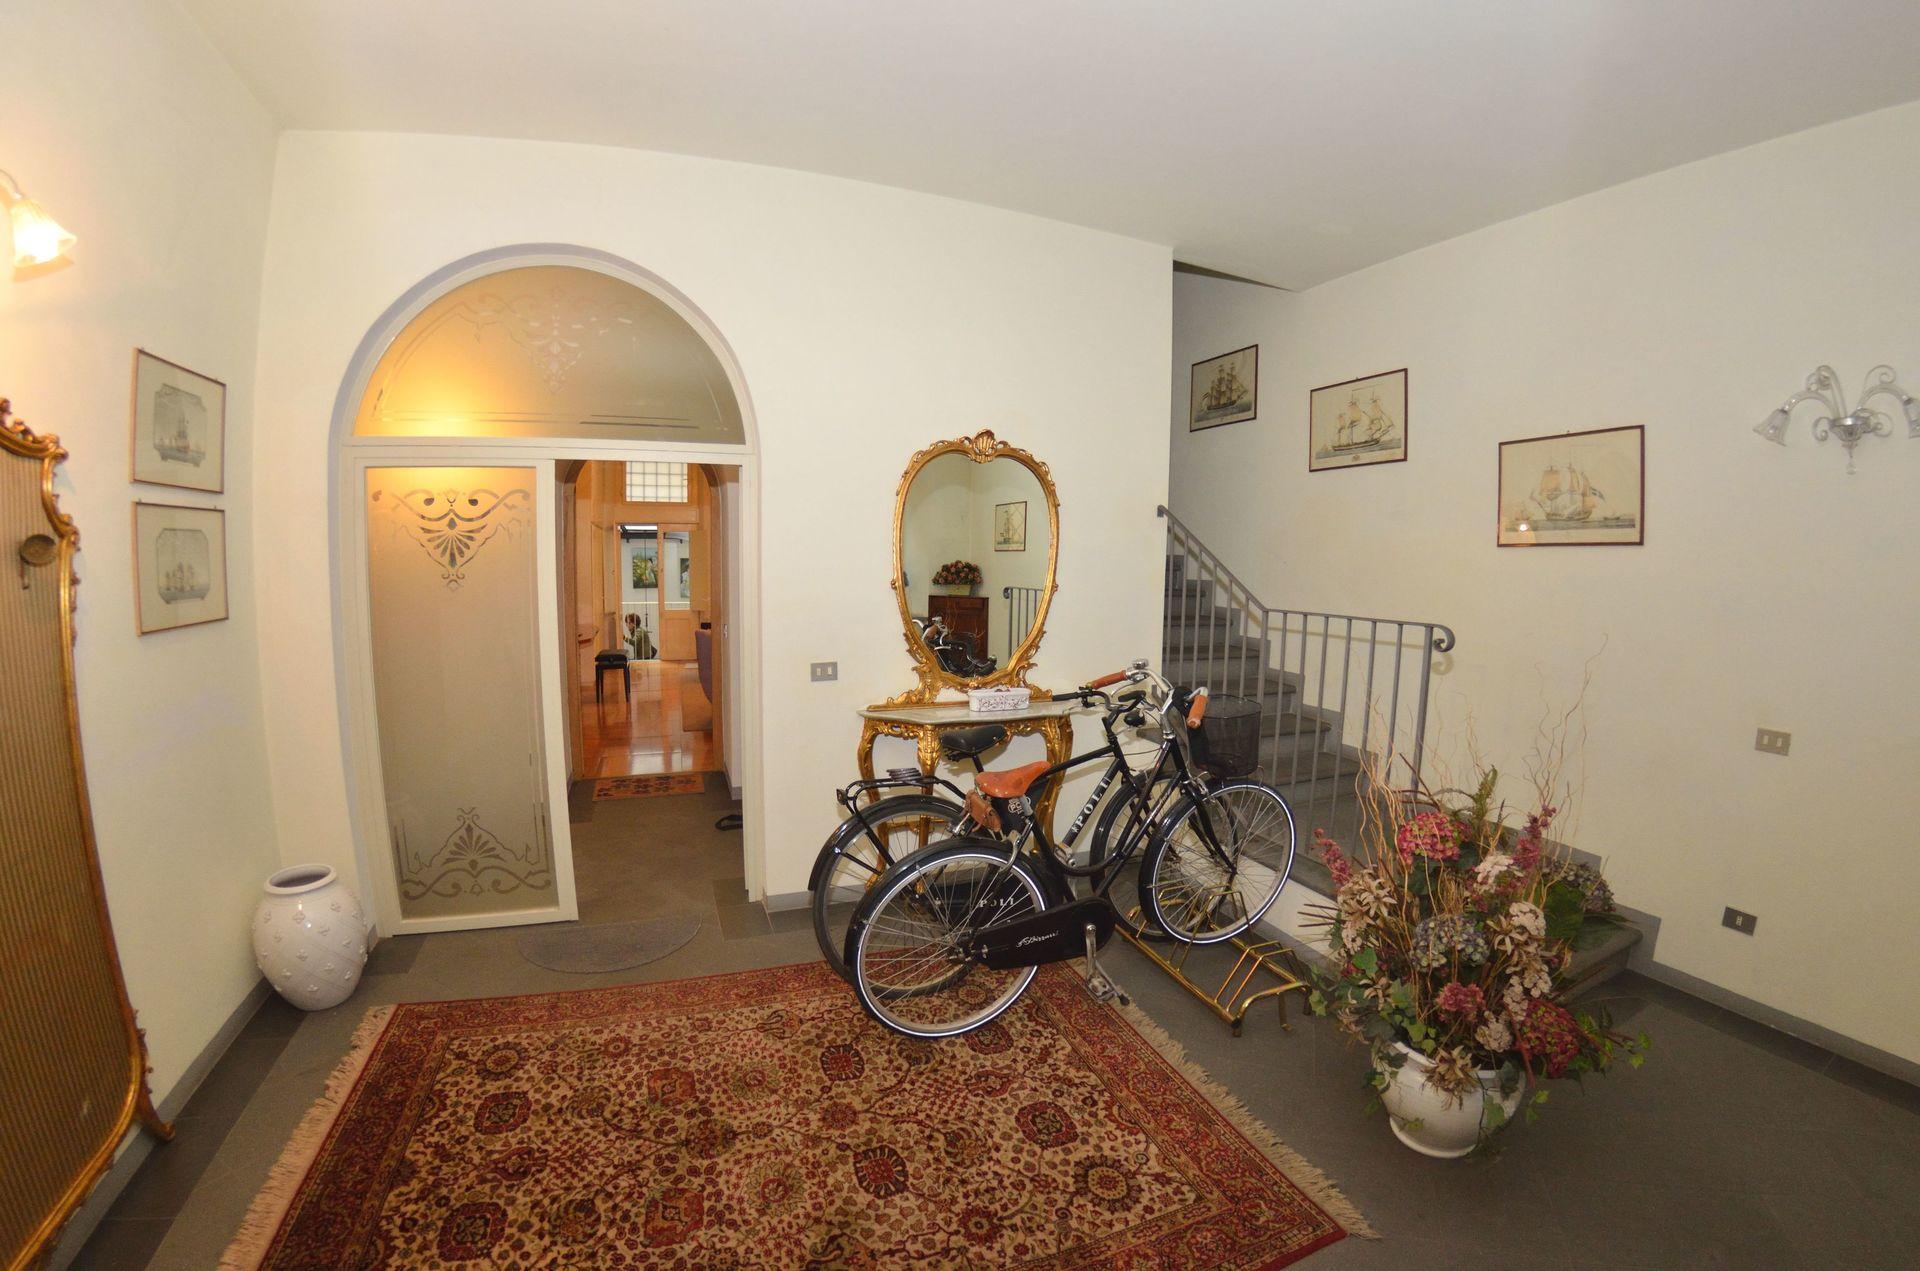 Porta Finestra Ingresso Casa casa stefy: villa that sleeps 4 people in 1 bedrooms